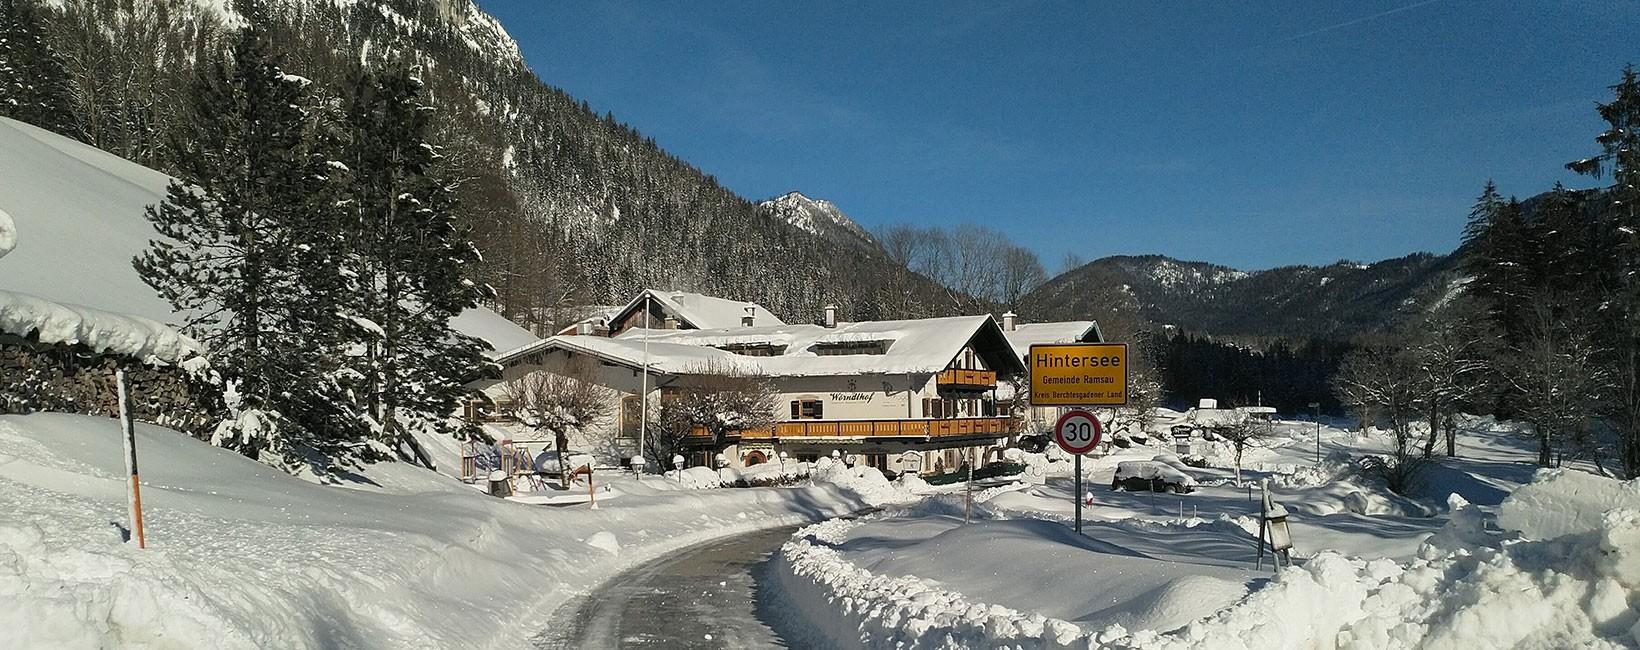 Gasthof Pension Wörndlhof - Hintersee - Berchtesgaden